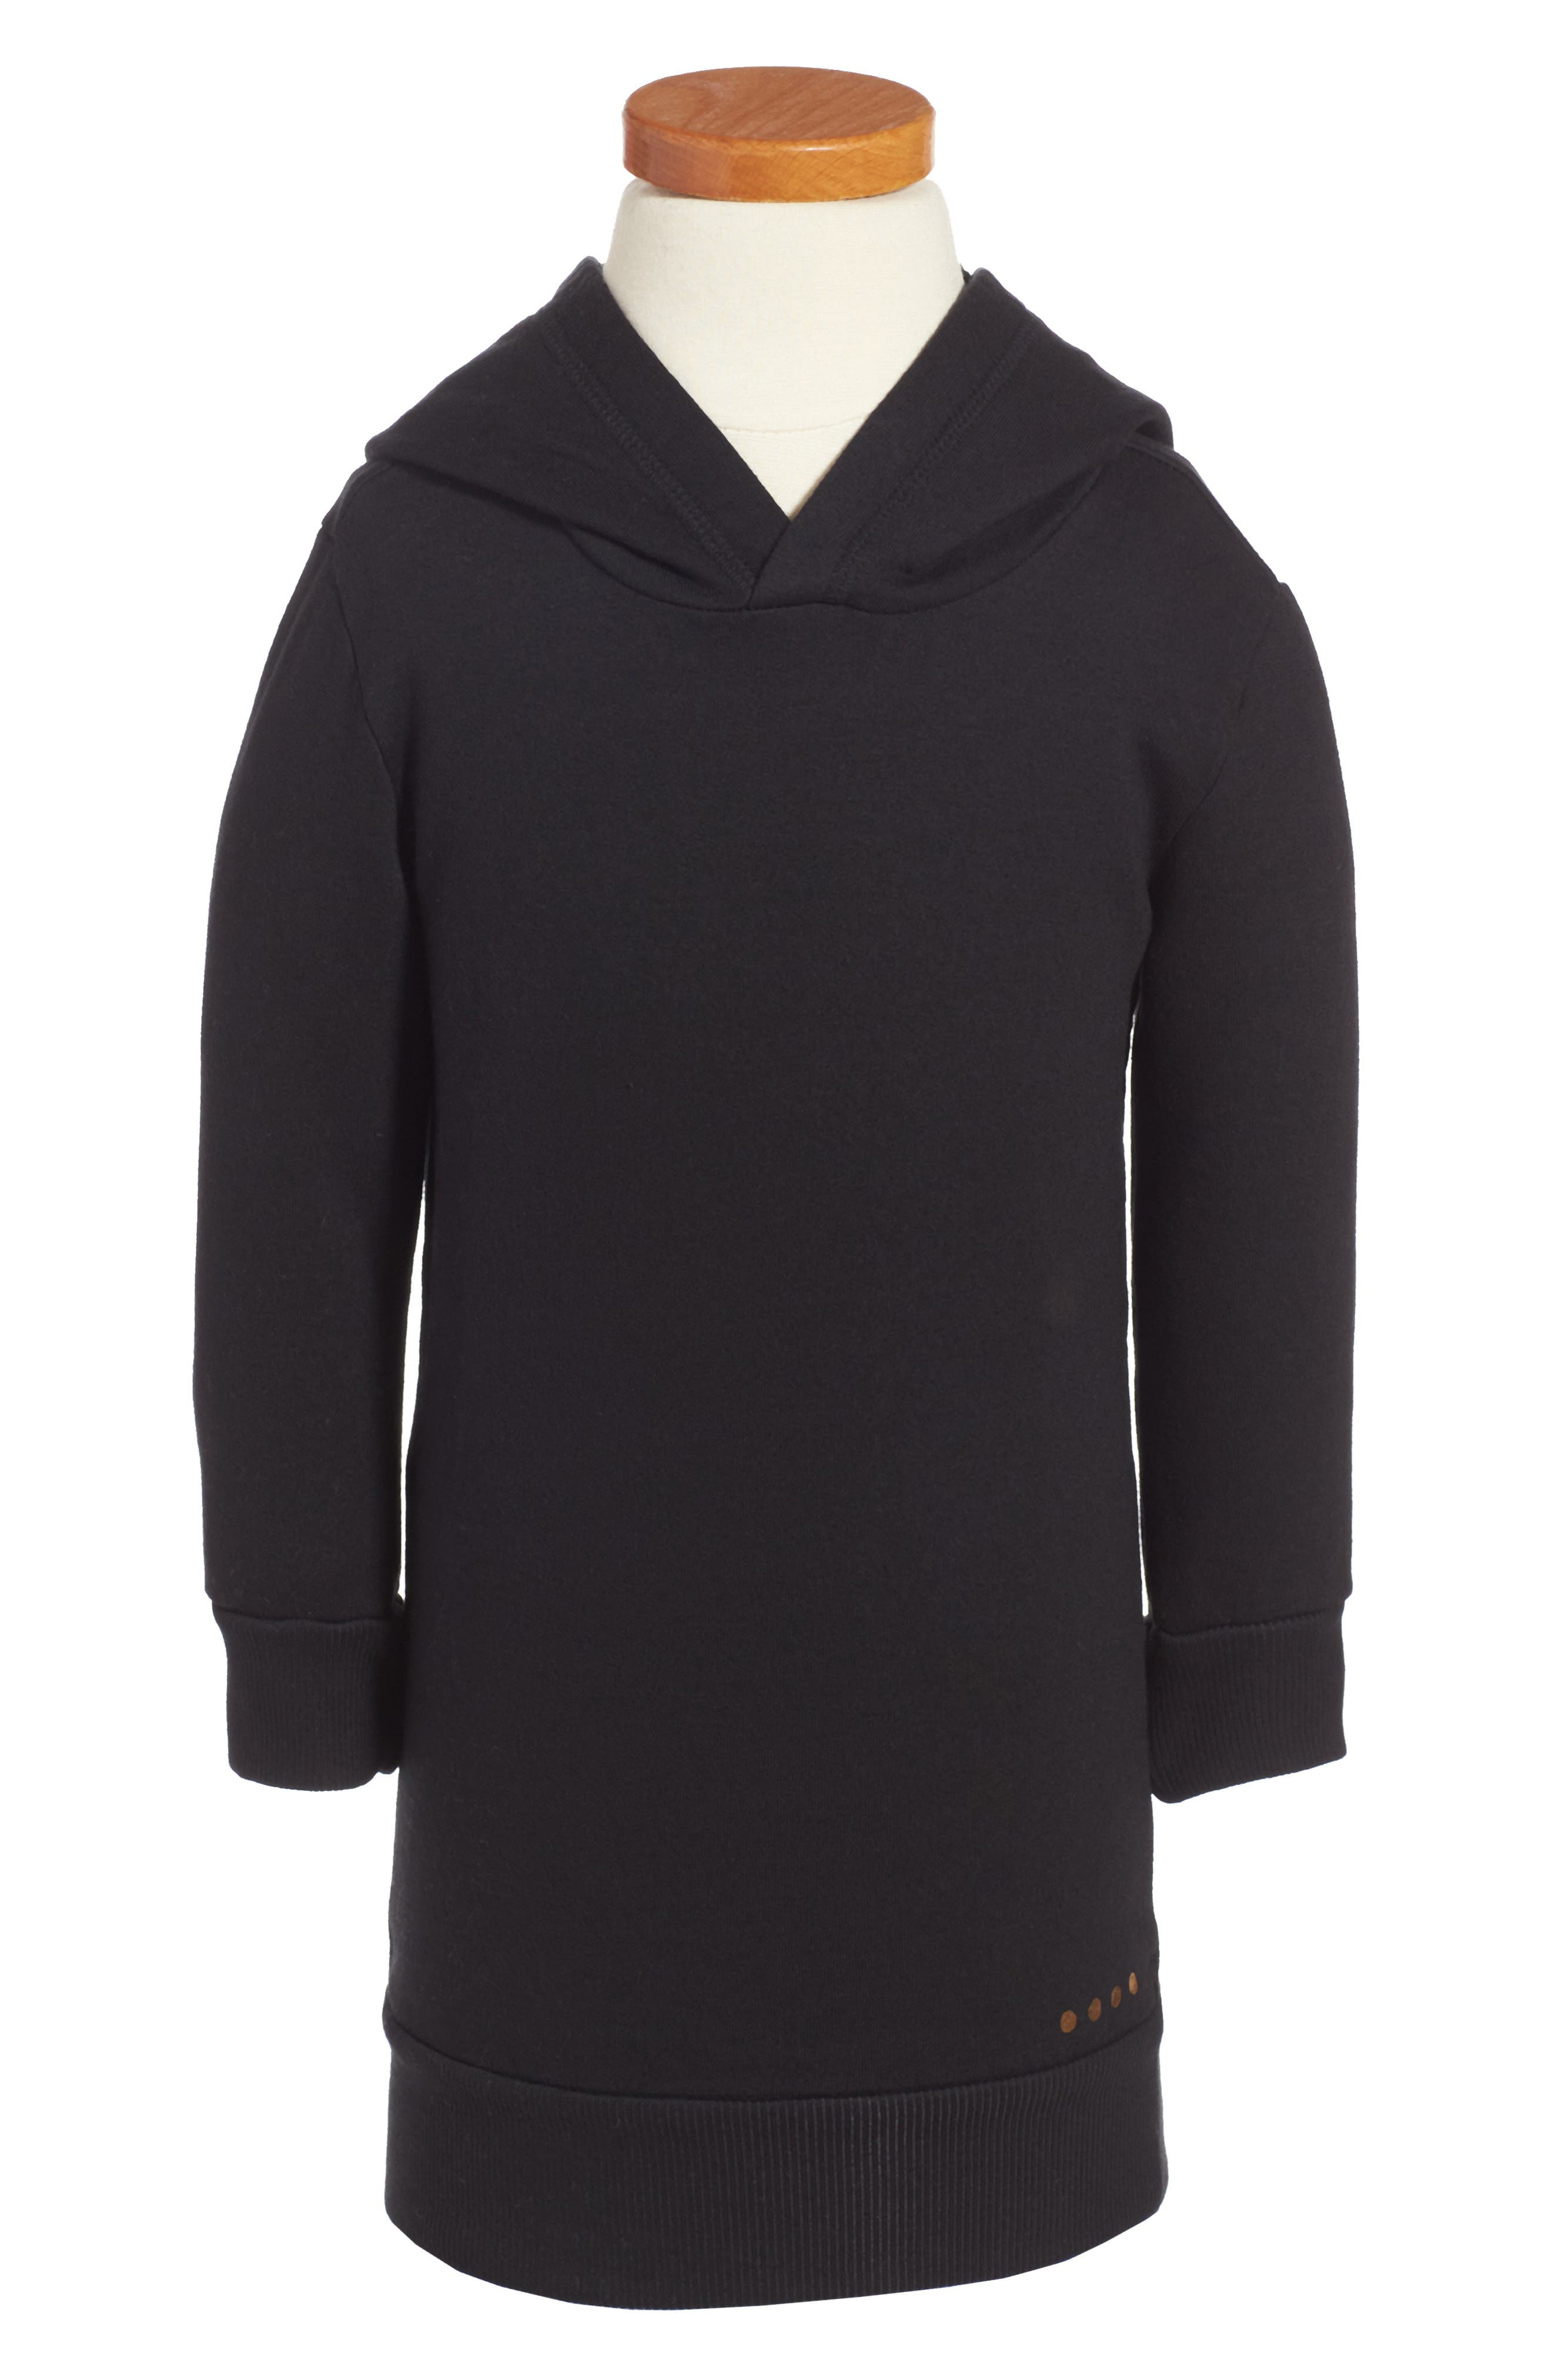 BERU Luna Hooded Organic Cotton Sweatshirt Dress (Toddler Girls & Little Girls)